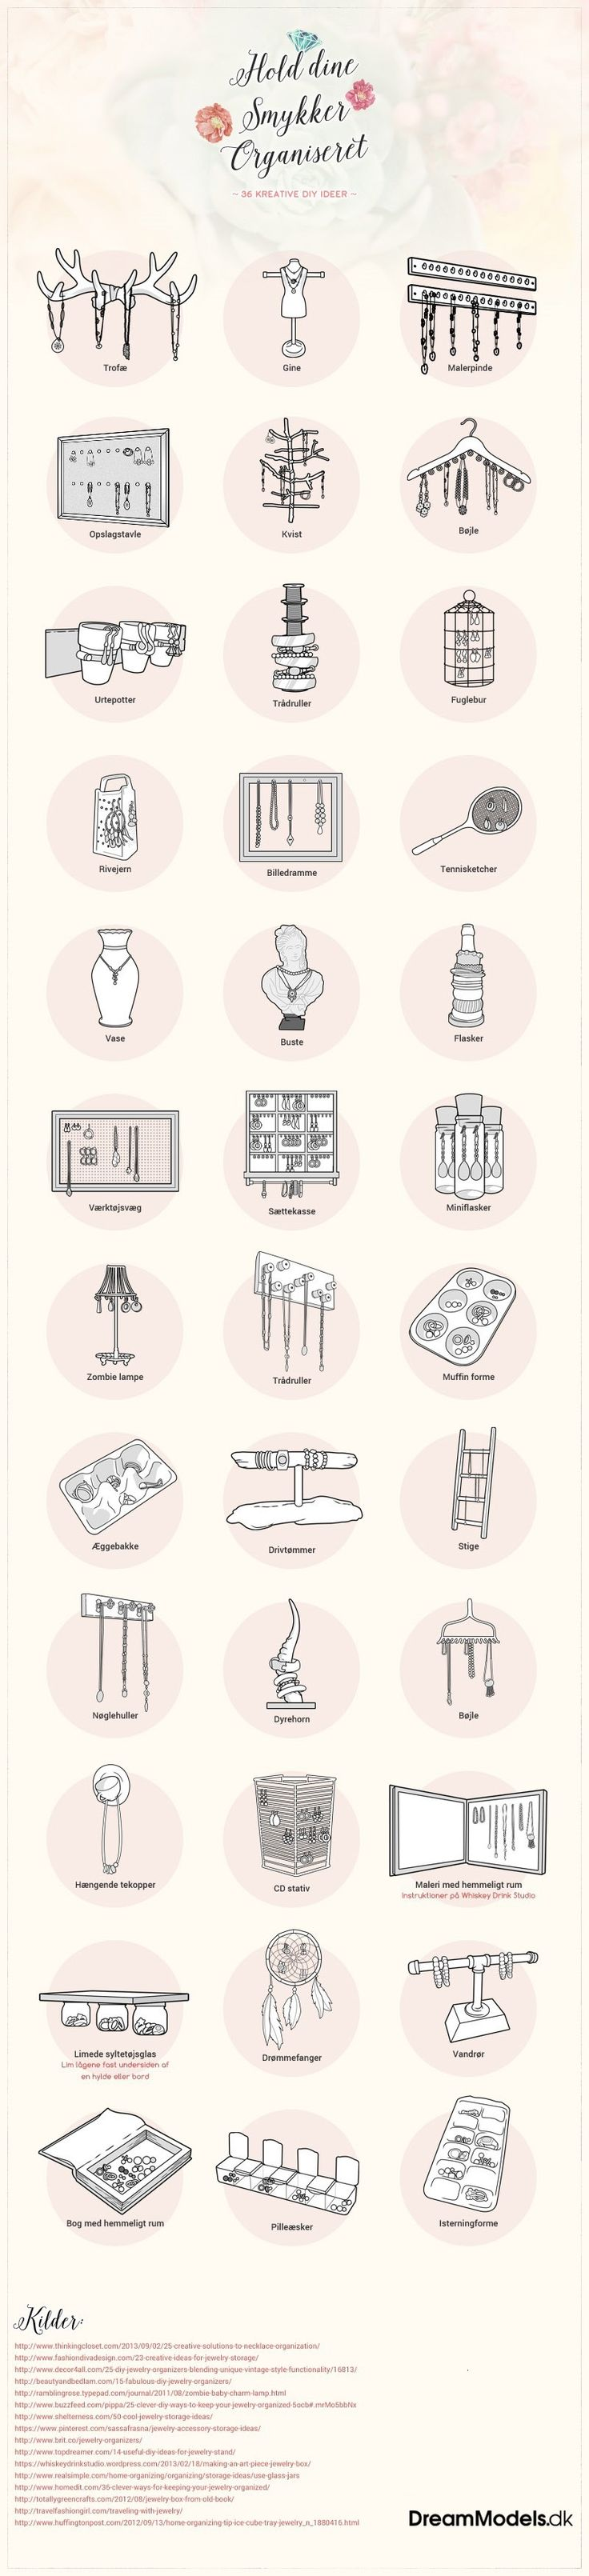 36 kreative smykkeopbevaring ideer